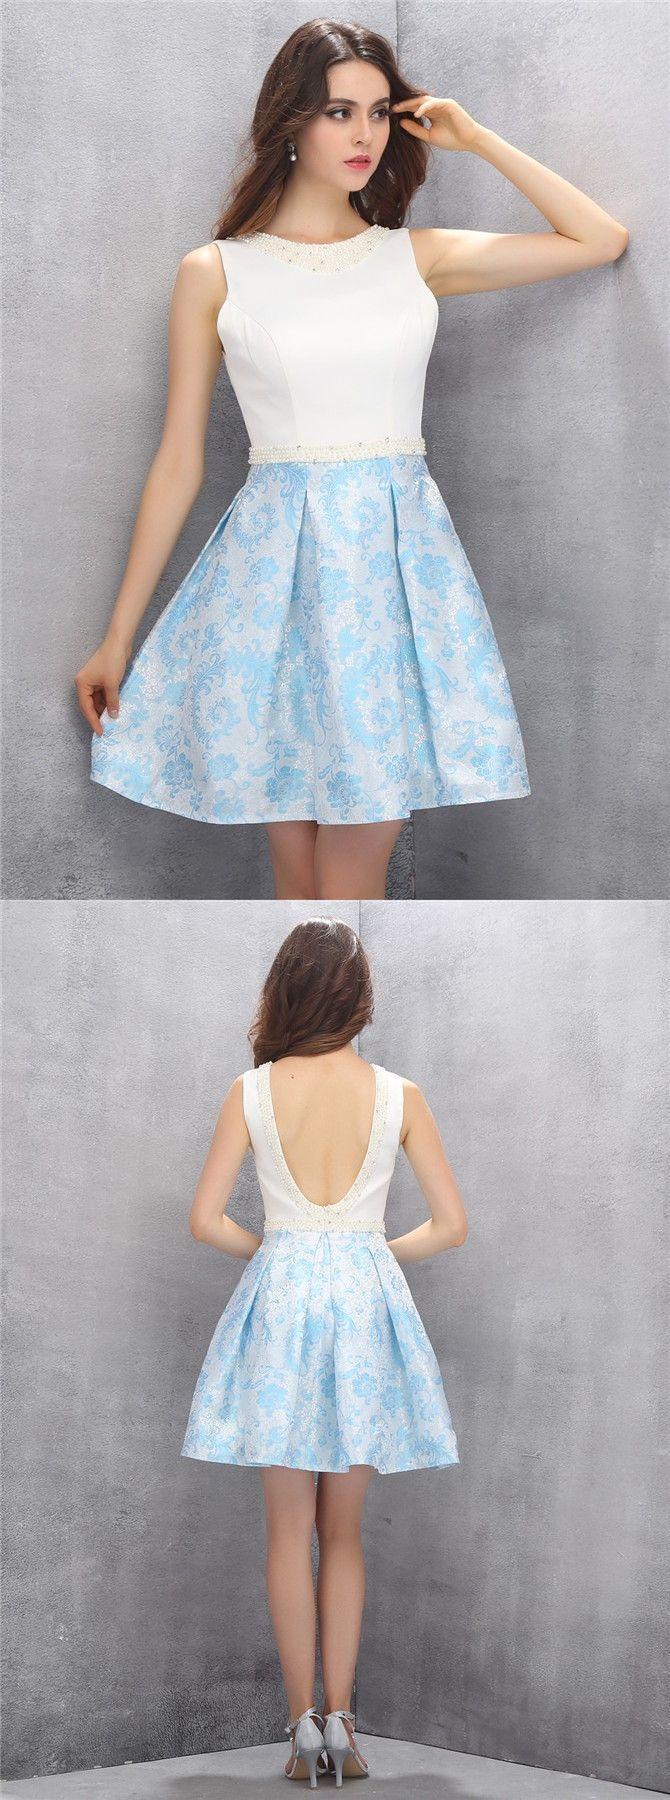 Blue Semi Formal Dresses Teenage Girls Fashion Dresses